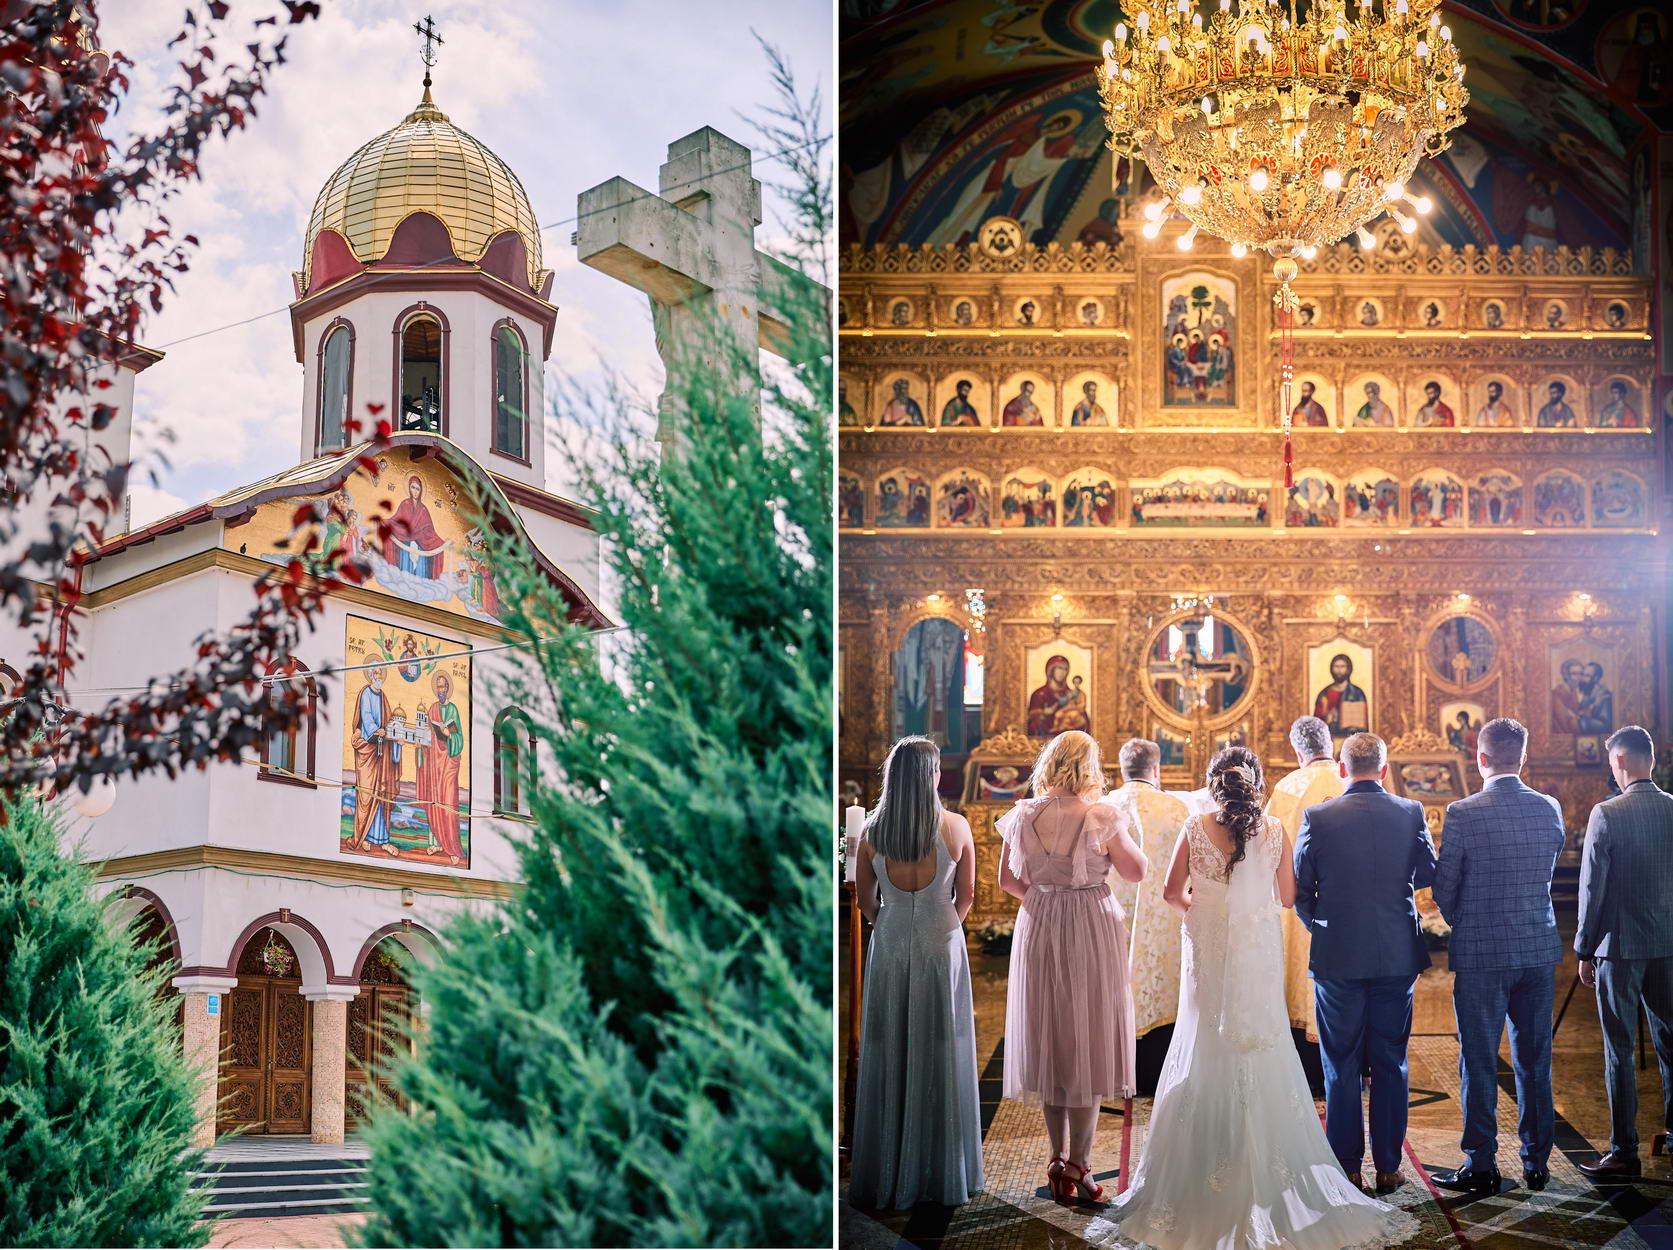 Fotografii Cununie Civila Si Religioasa Ghimbav (10)